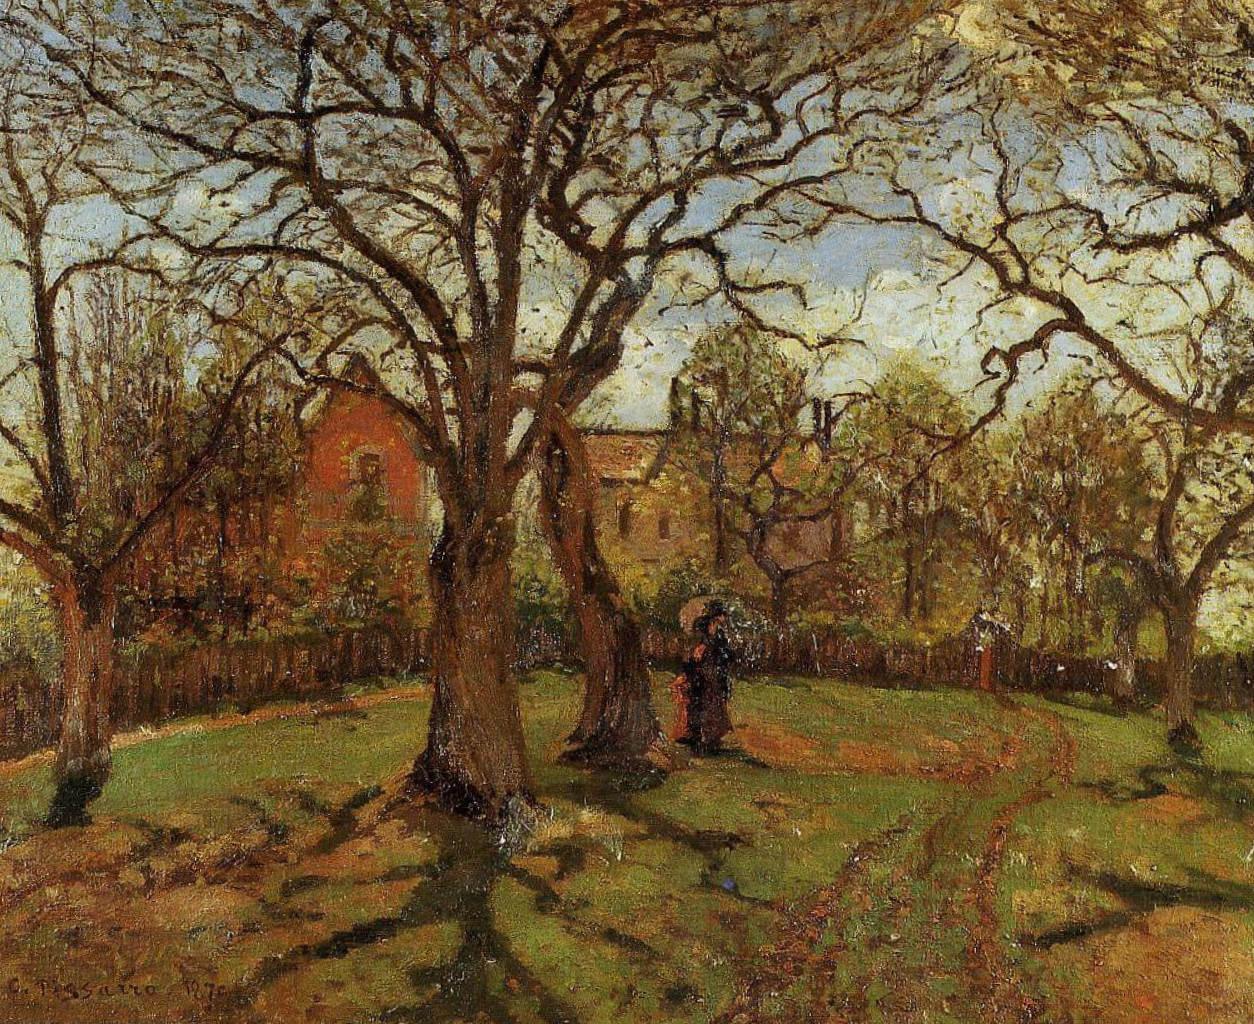 Каштаны, весна - Камиль Писсарро (1870, Музей д'Орсэ, Париж)